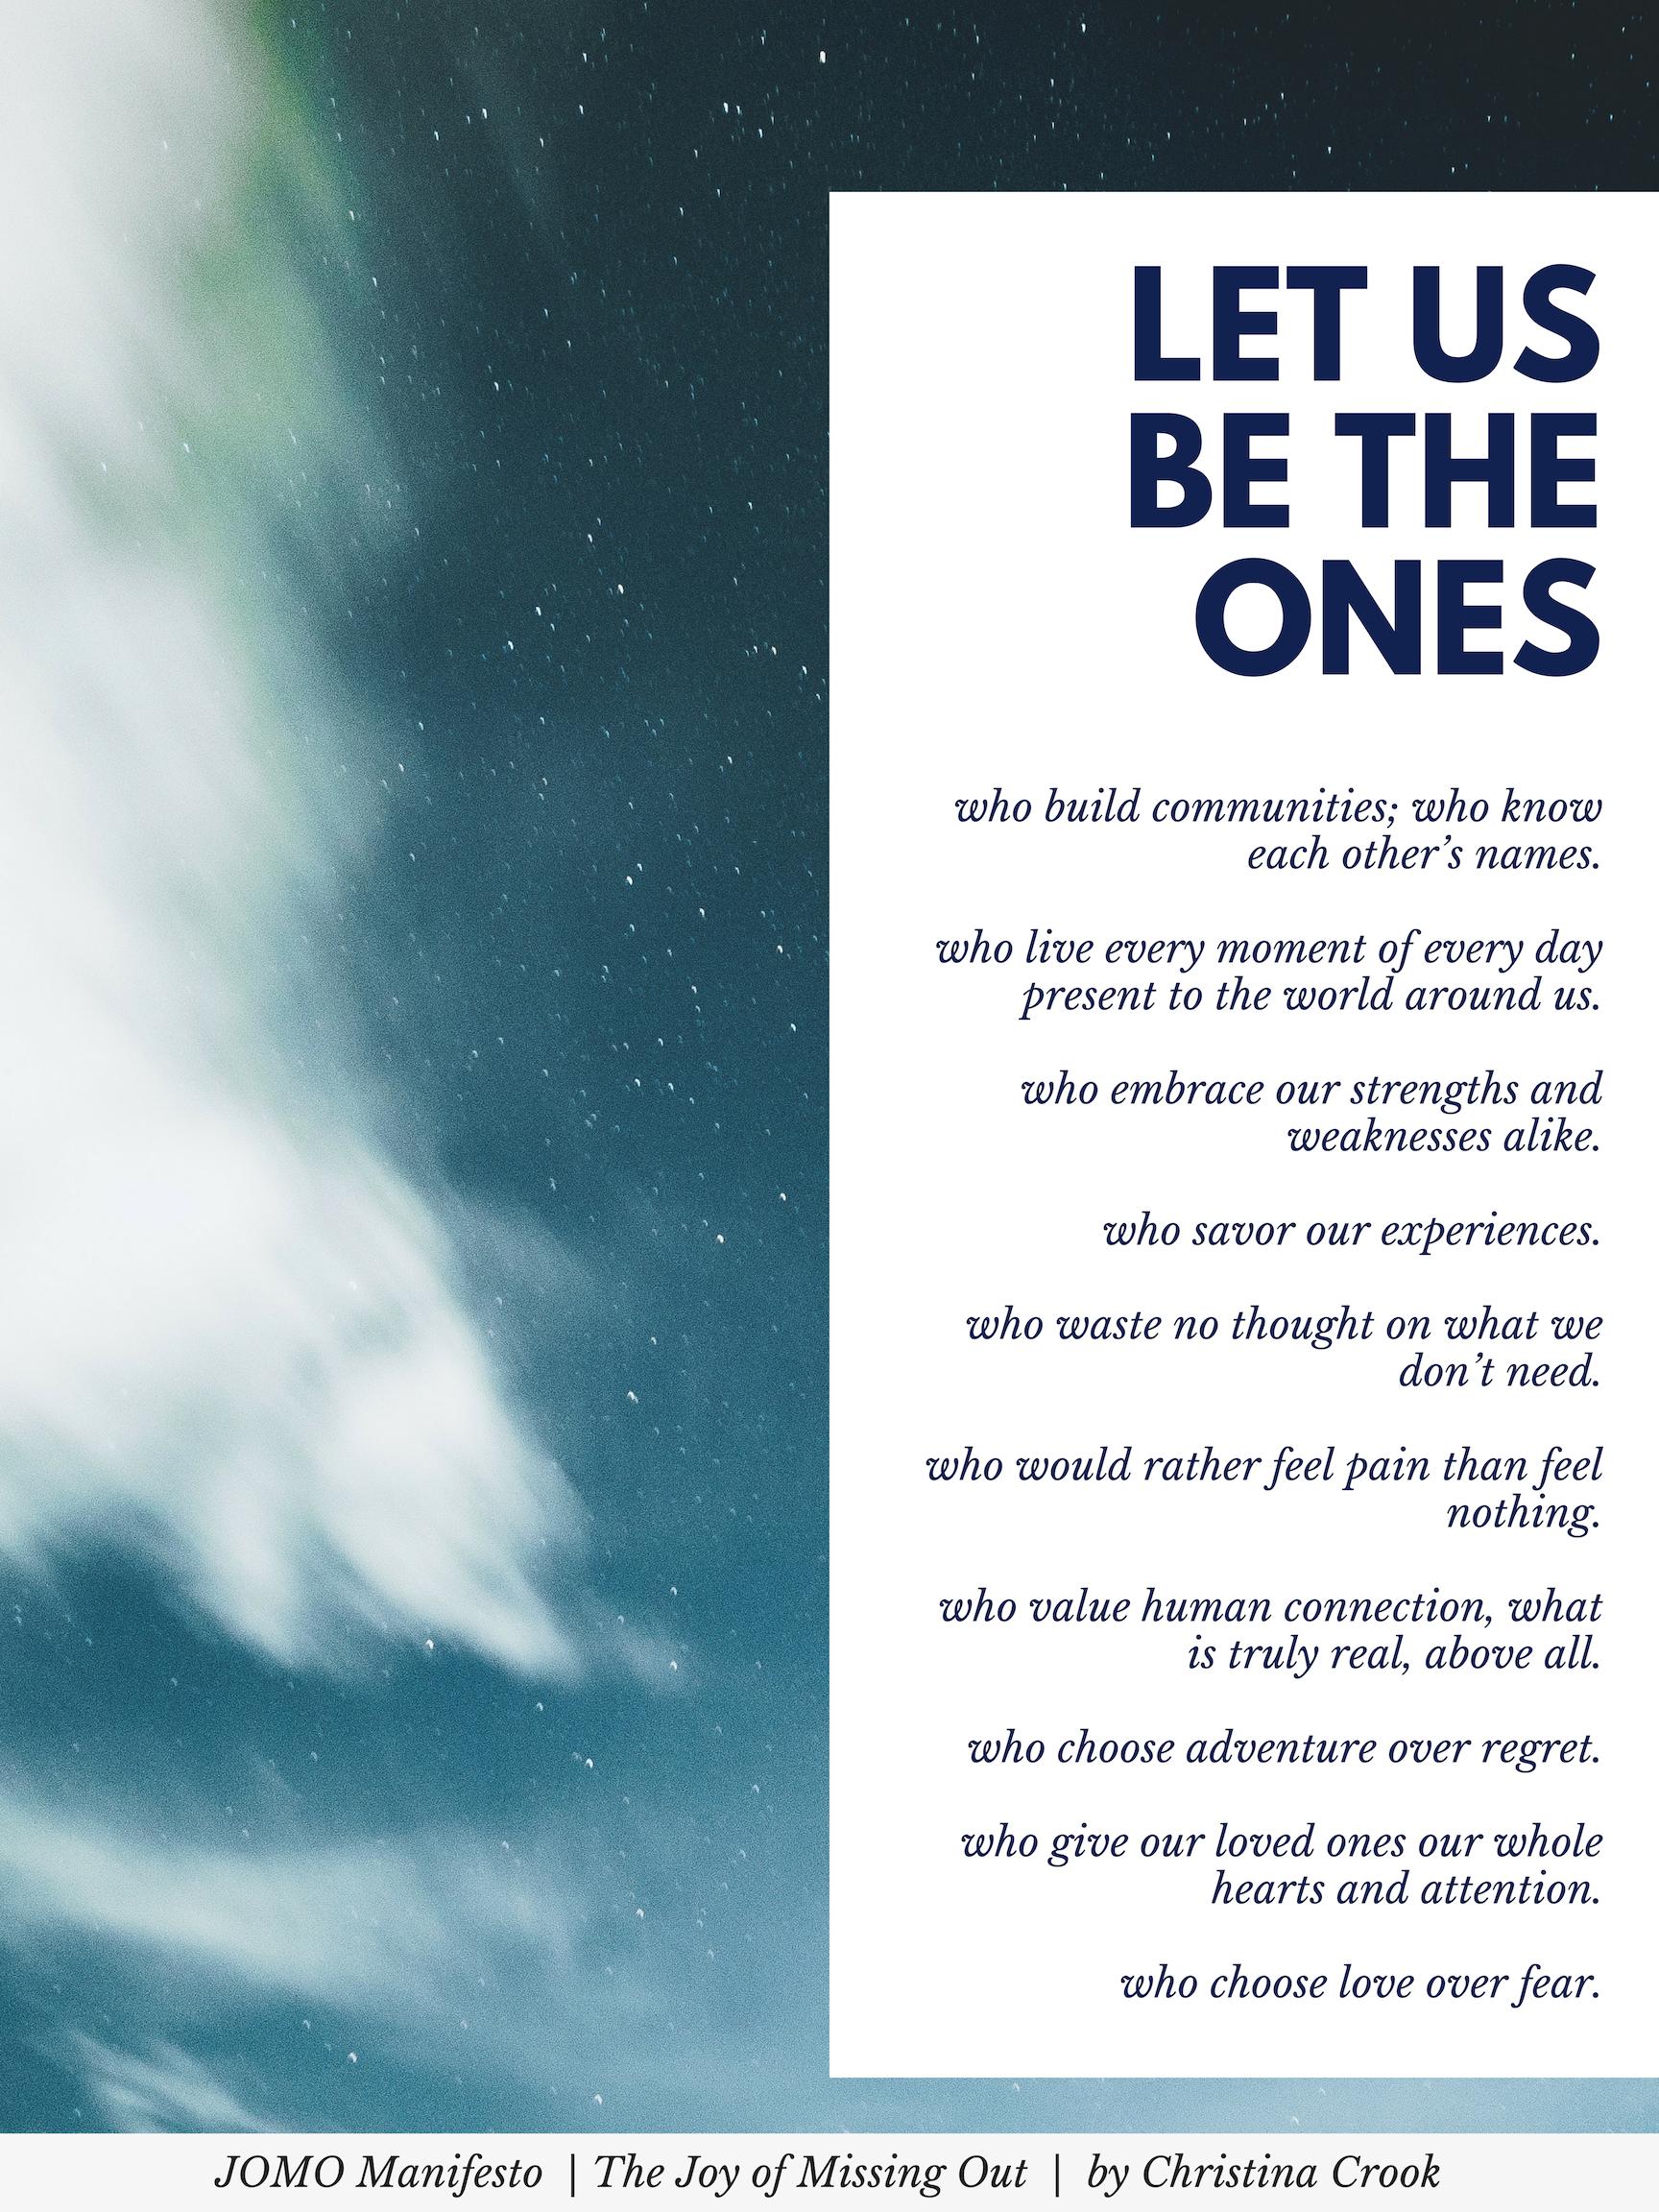 The JOMO Manifesto.png